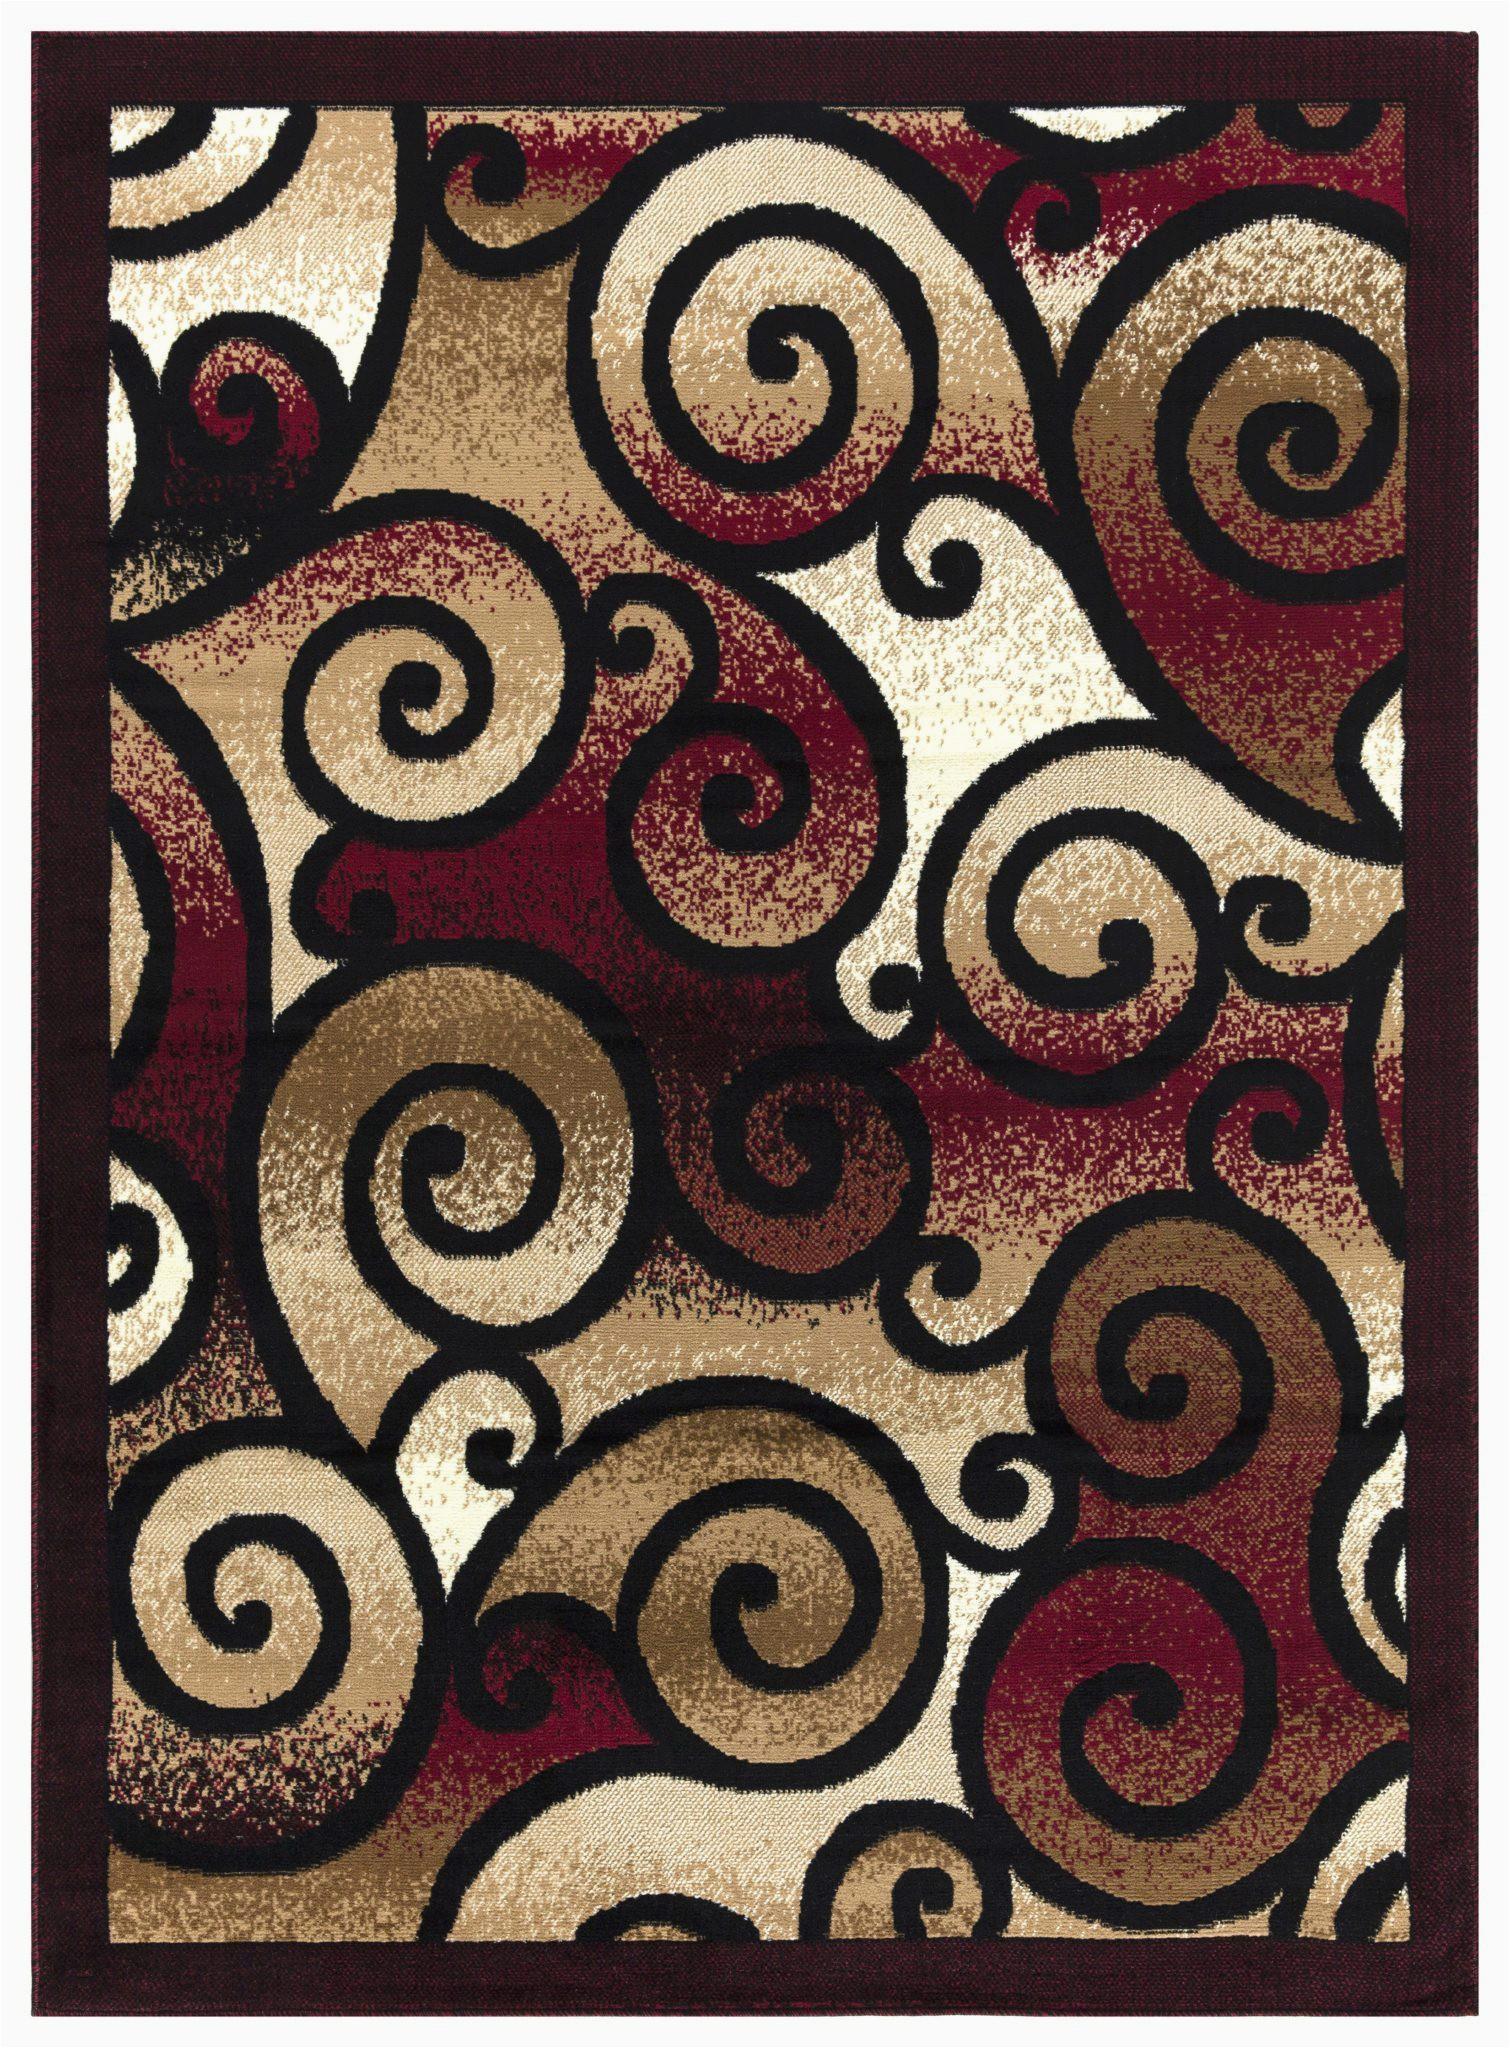 princess collection geometric swirl abstract area rug 806 burgundy black